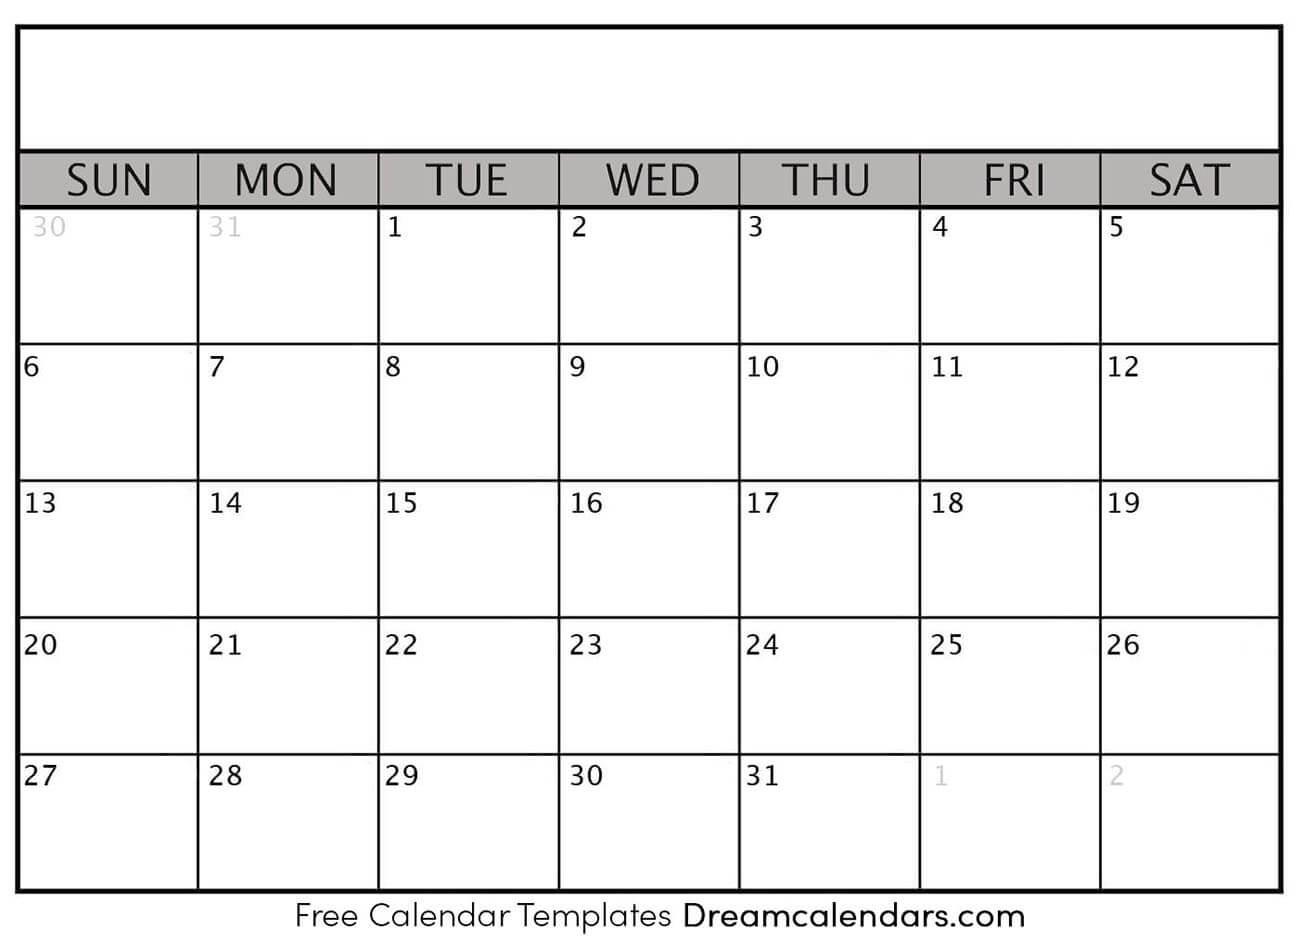 Printable Blank Calendar - Dream Calendars-Calendar Blank With Numbers And Printable